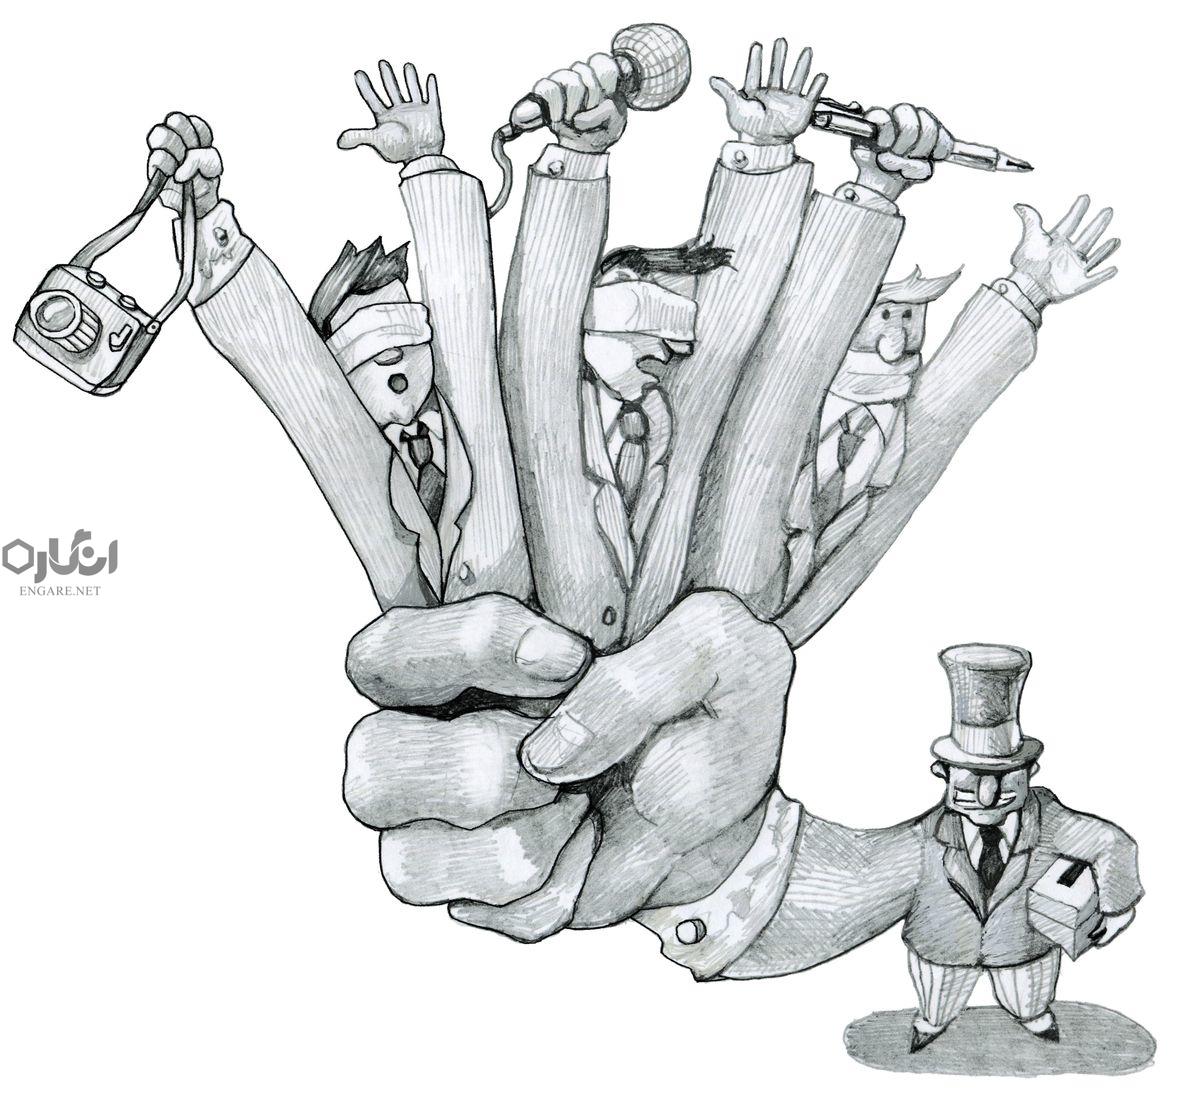 censors - فرهنگ حذف و سیاست سانسور - محمد مختاری, کانون نویسندگان ایران, فرهنگ سانسور, فرهنگ حذف و سیاست سانسور, سانسور در ایران, دموکراسی, حذف و سانسور, جامعه مدنی, تمرین مدارا, تعدیل اقتصادی, آزادی بیان, آزادی اندیشه